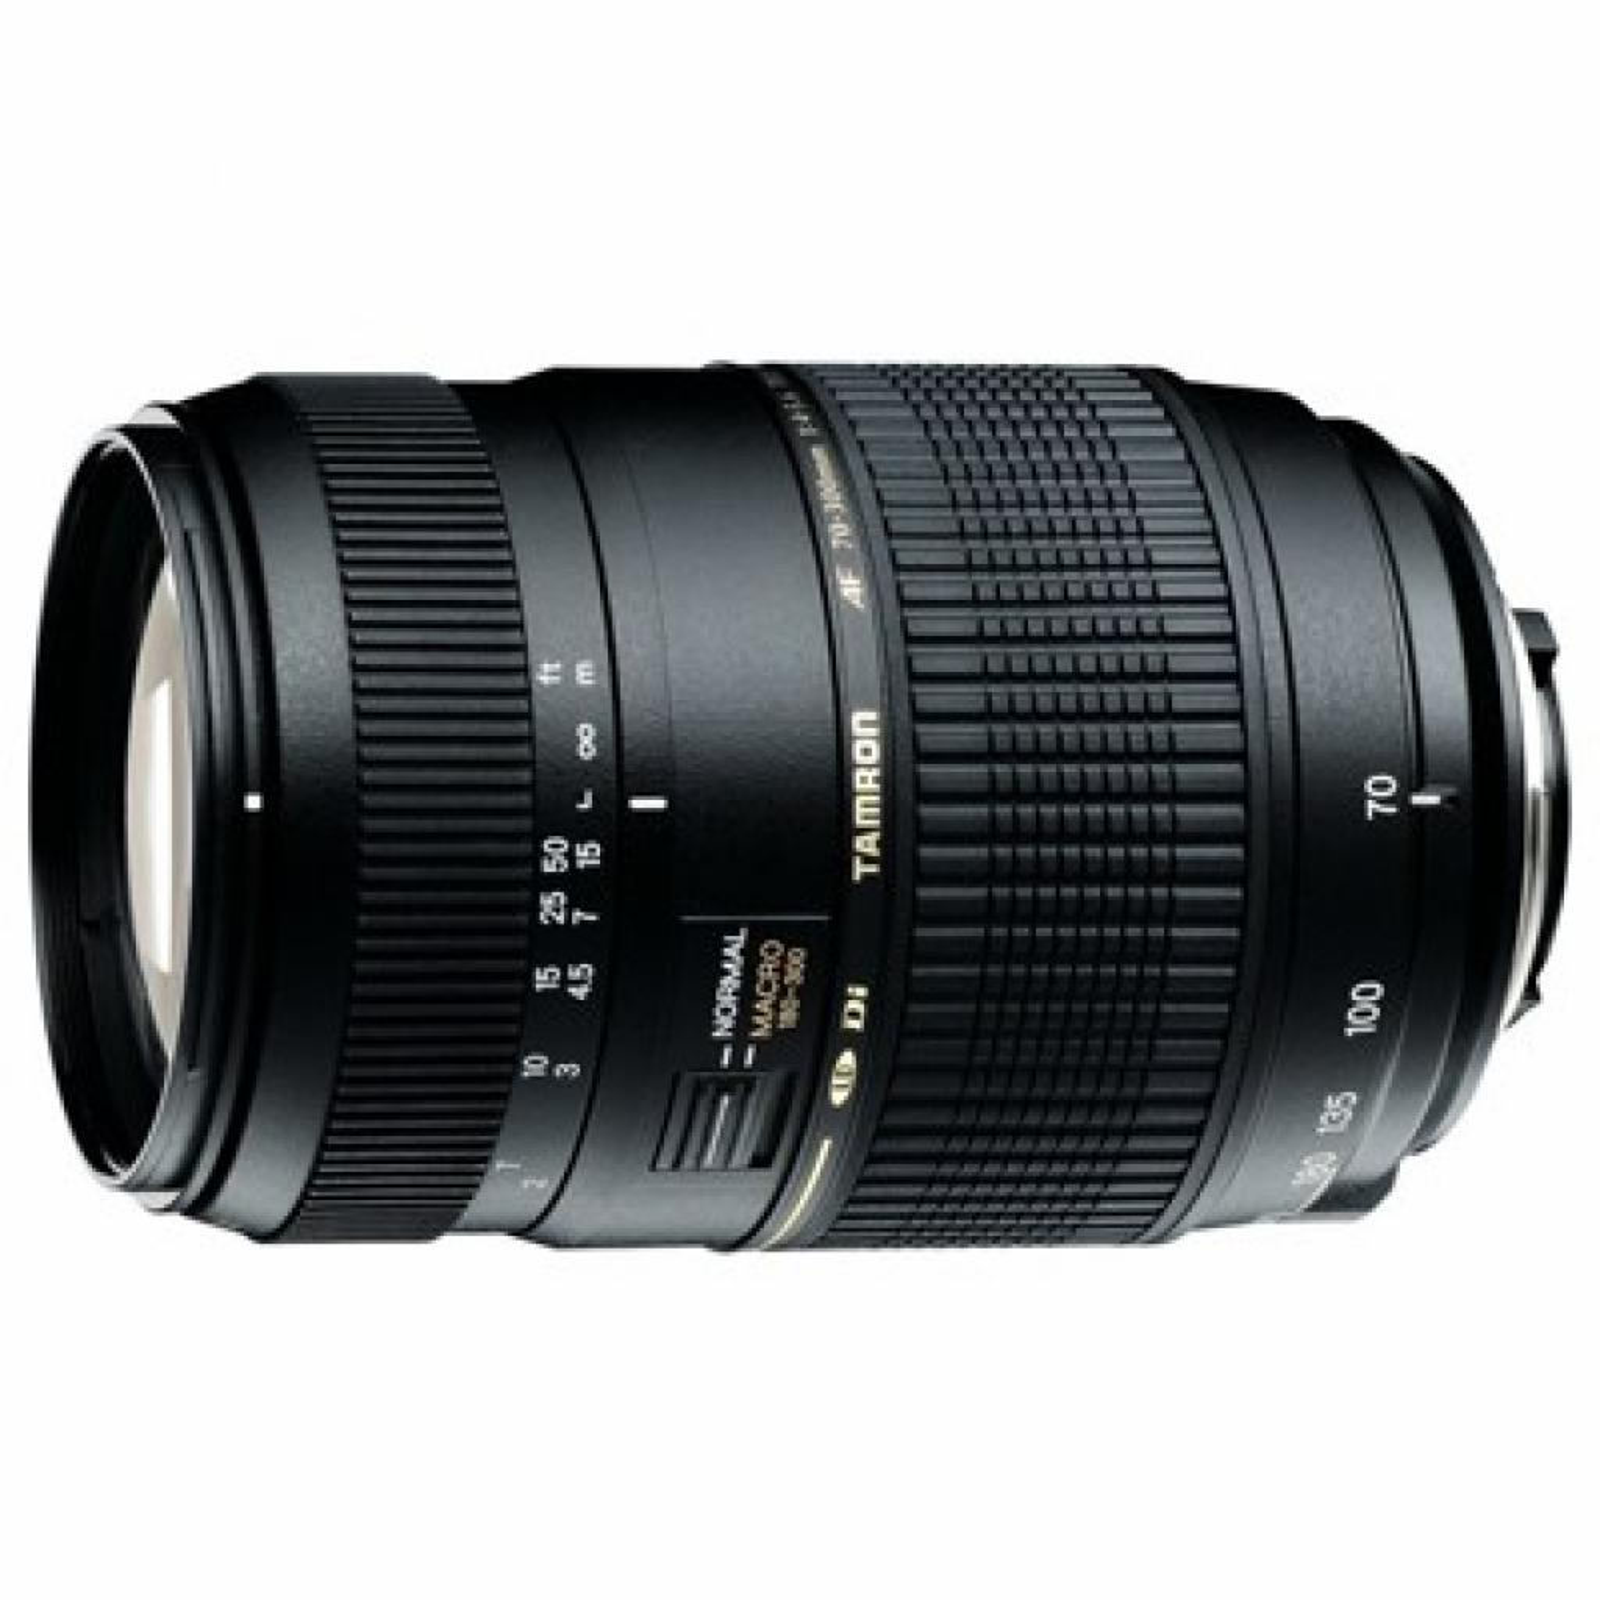 Объектив Tamron AF 70-300 f/4-5.6 Di LD macro 1:2 for Nikon (AF 70-300mm macro for Nikon)